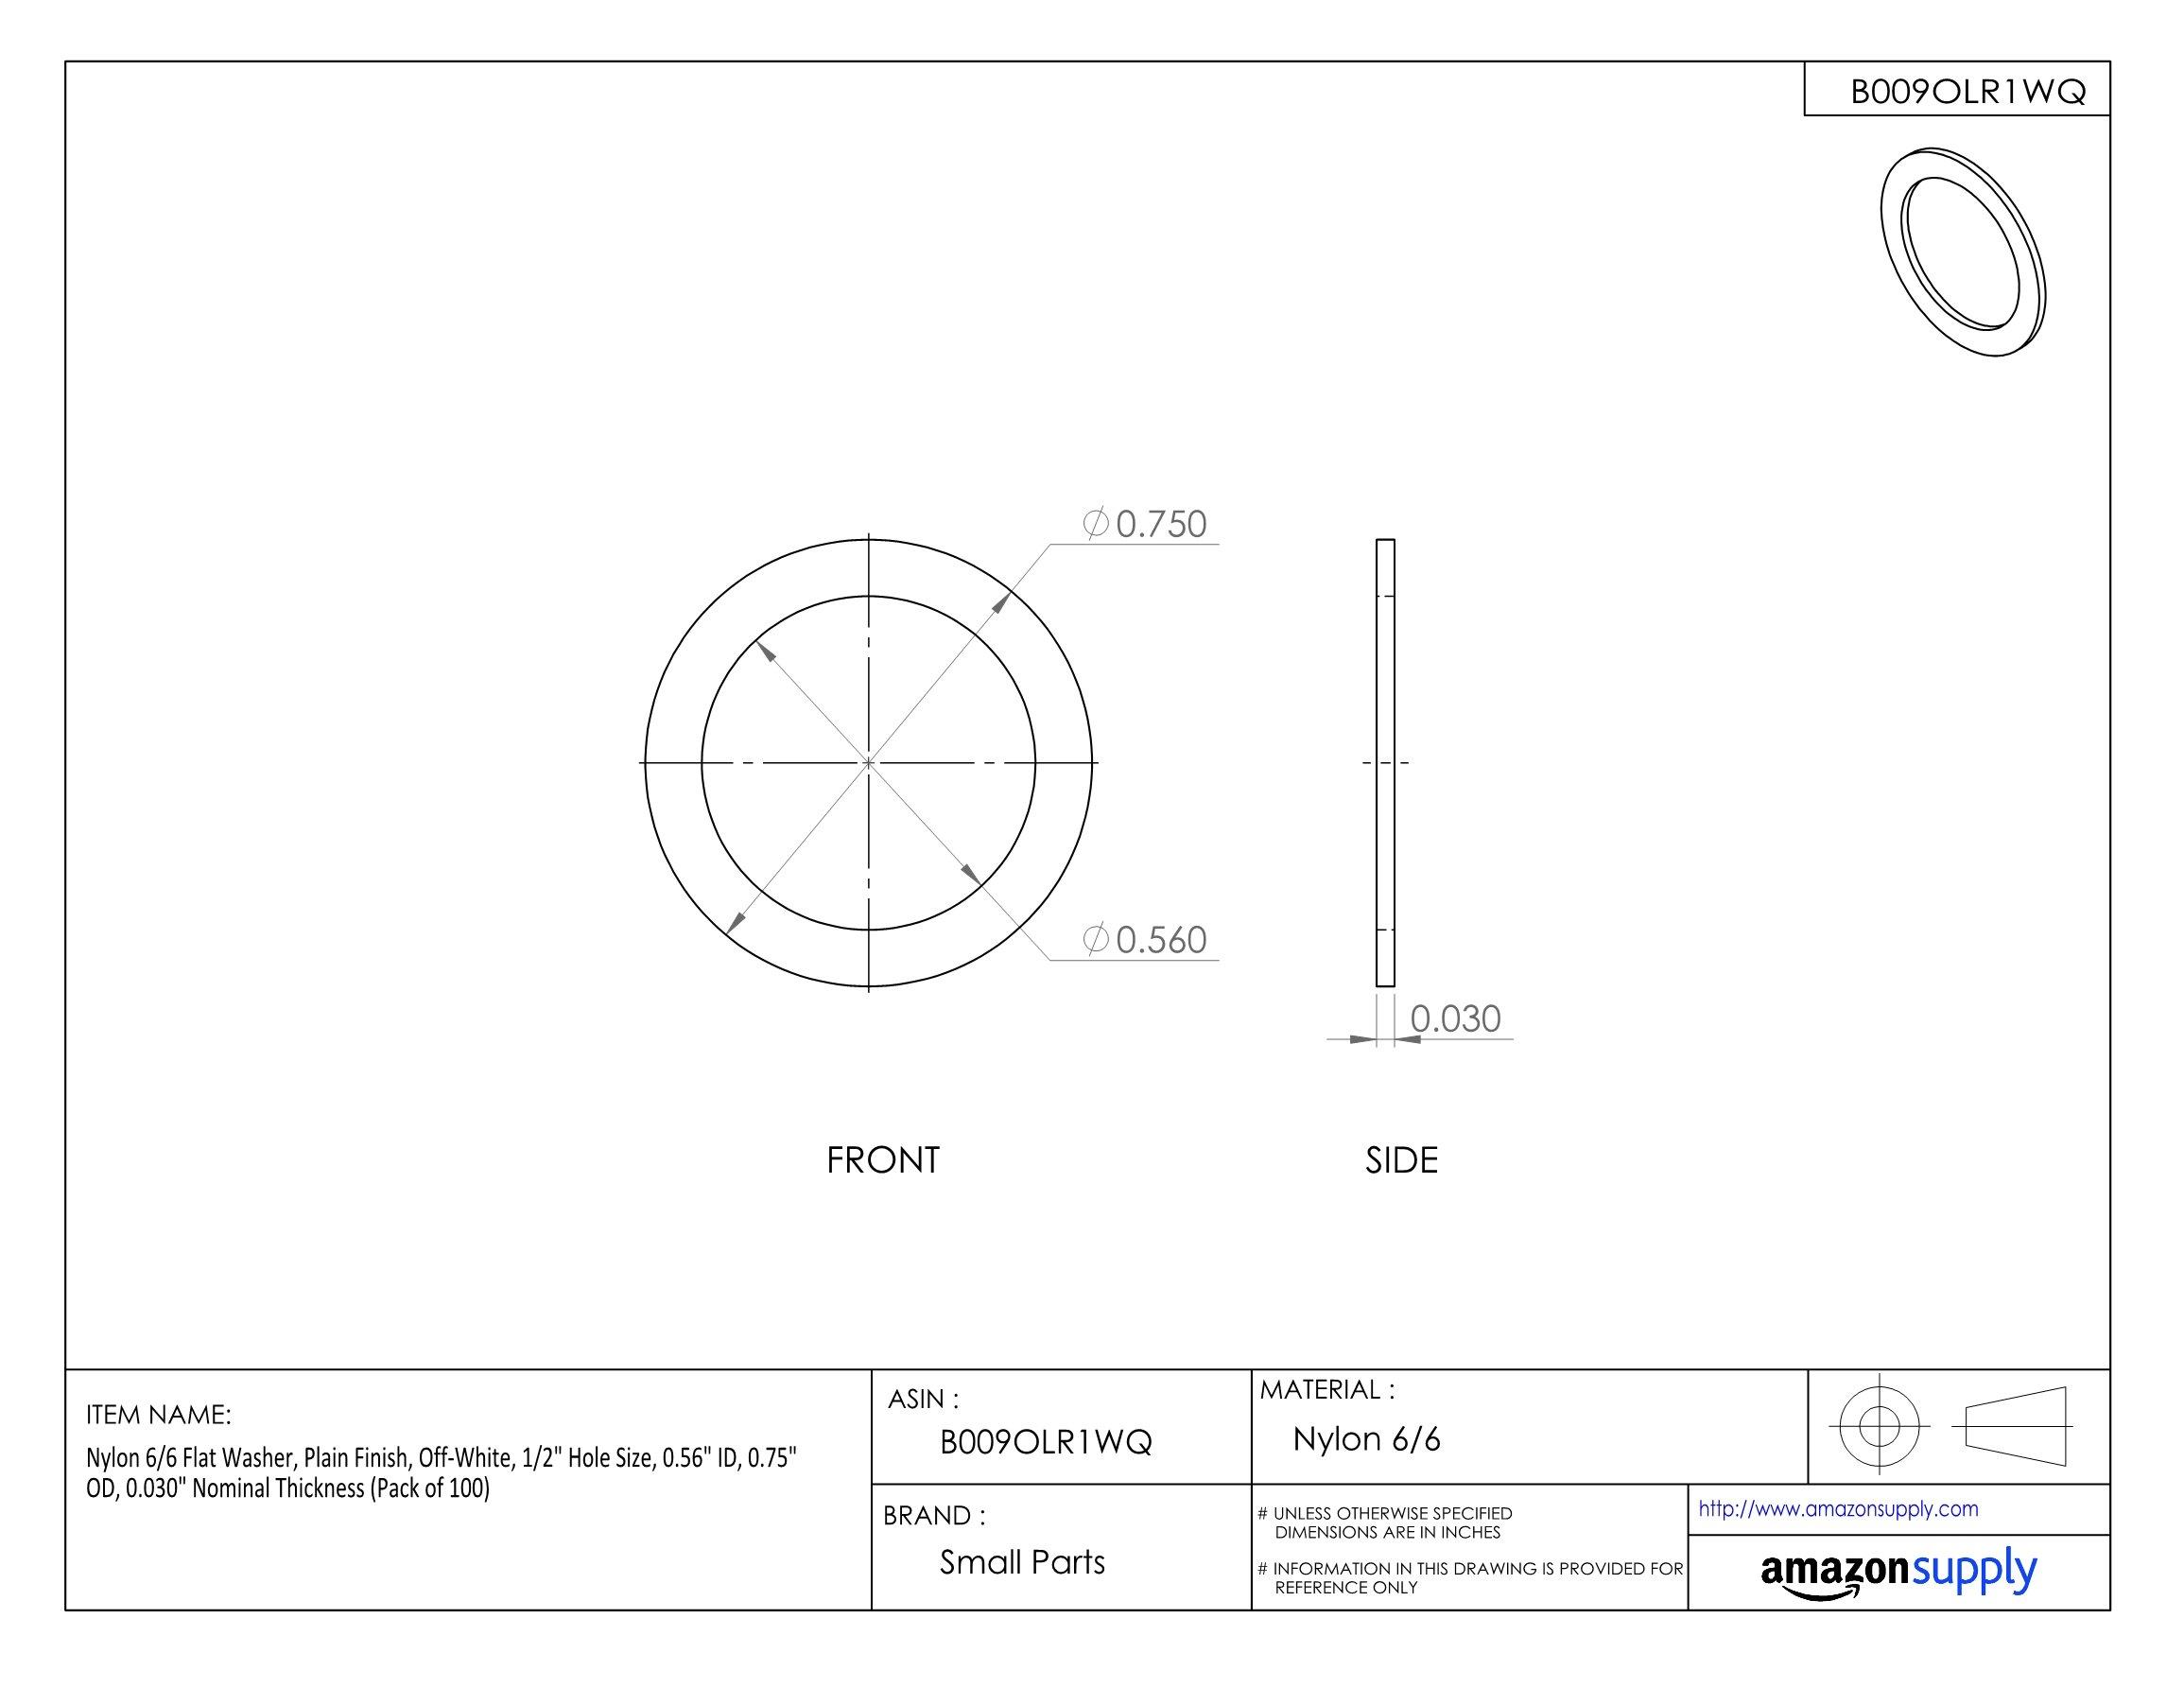 Nylon 6/6 Flat Washer, Plain Finish, Off-White, 1/2'' Hole Size, 0.56'' ID, 0.75'' OD, 0.030'' Nominal Thickness (Pack of 100)